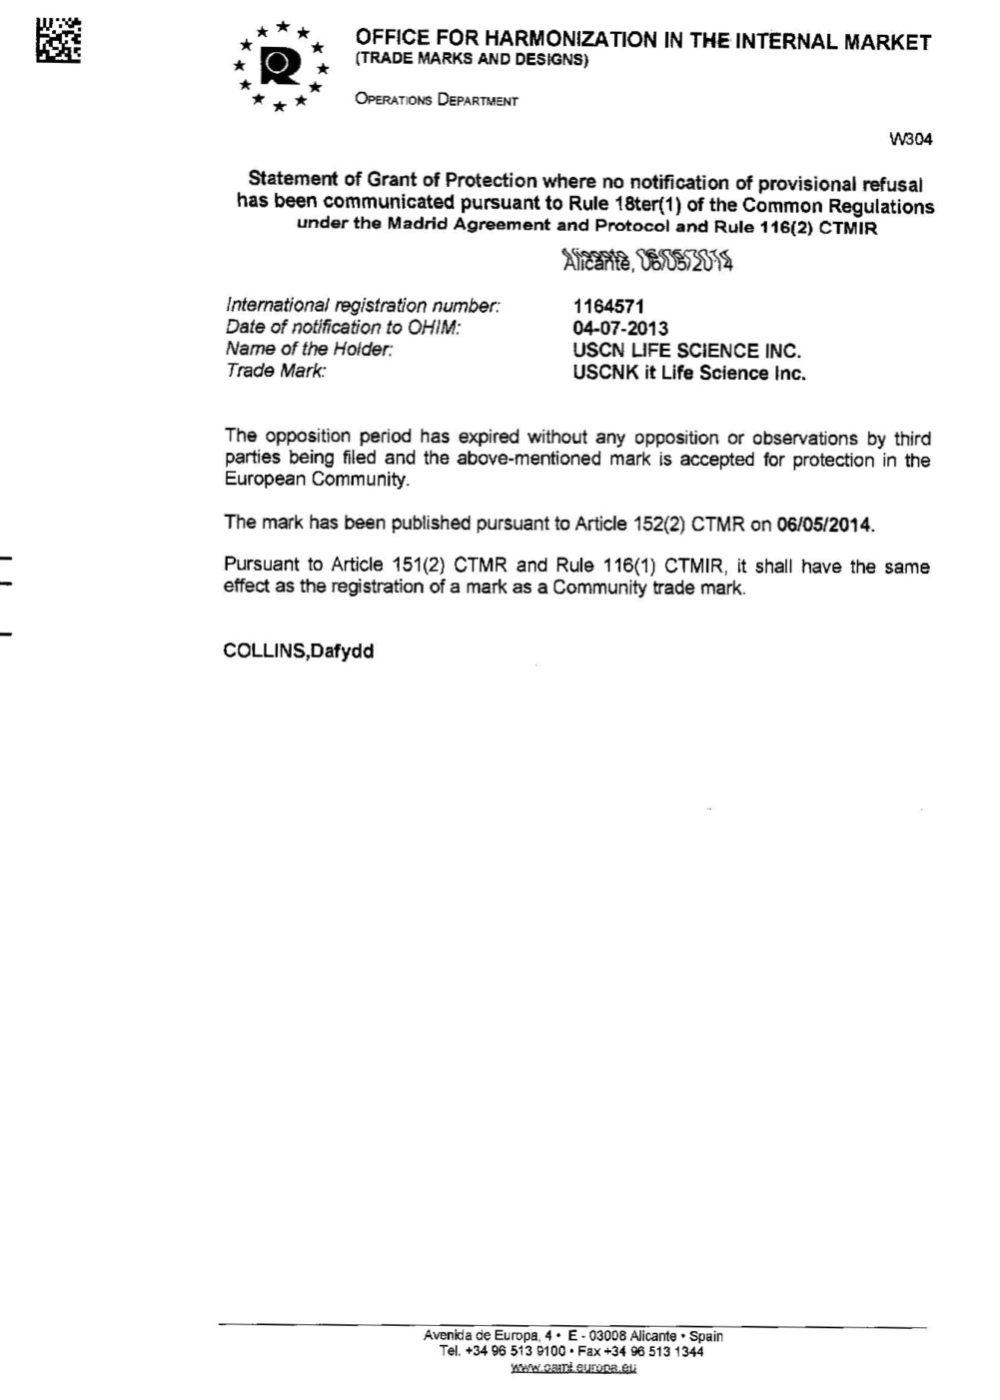 USCNK歐盟商標《授權保護通知書》